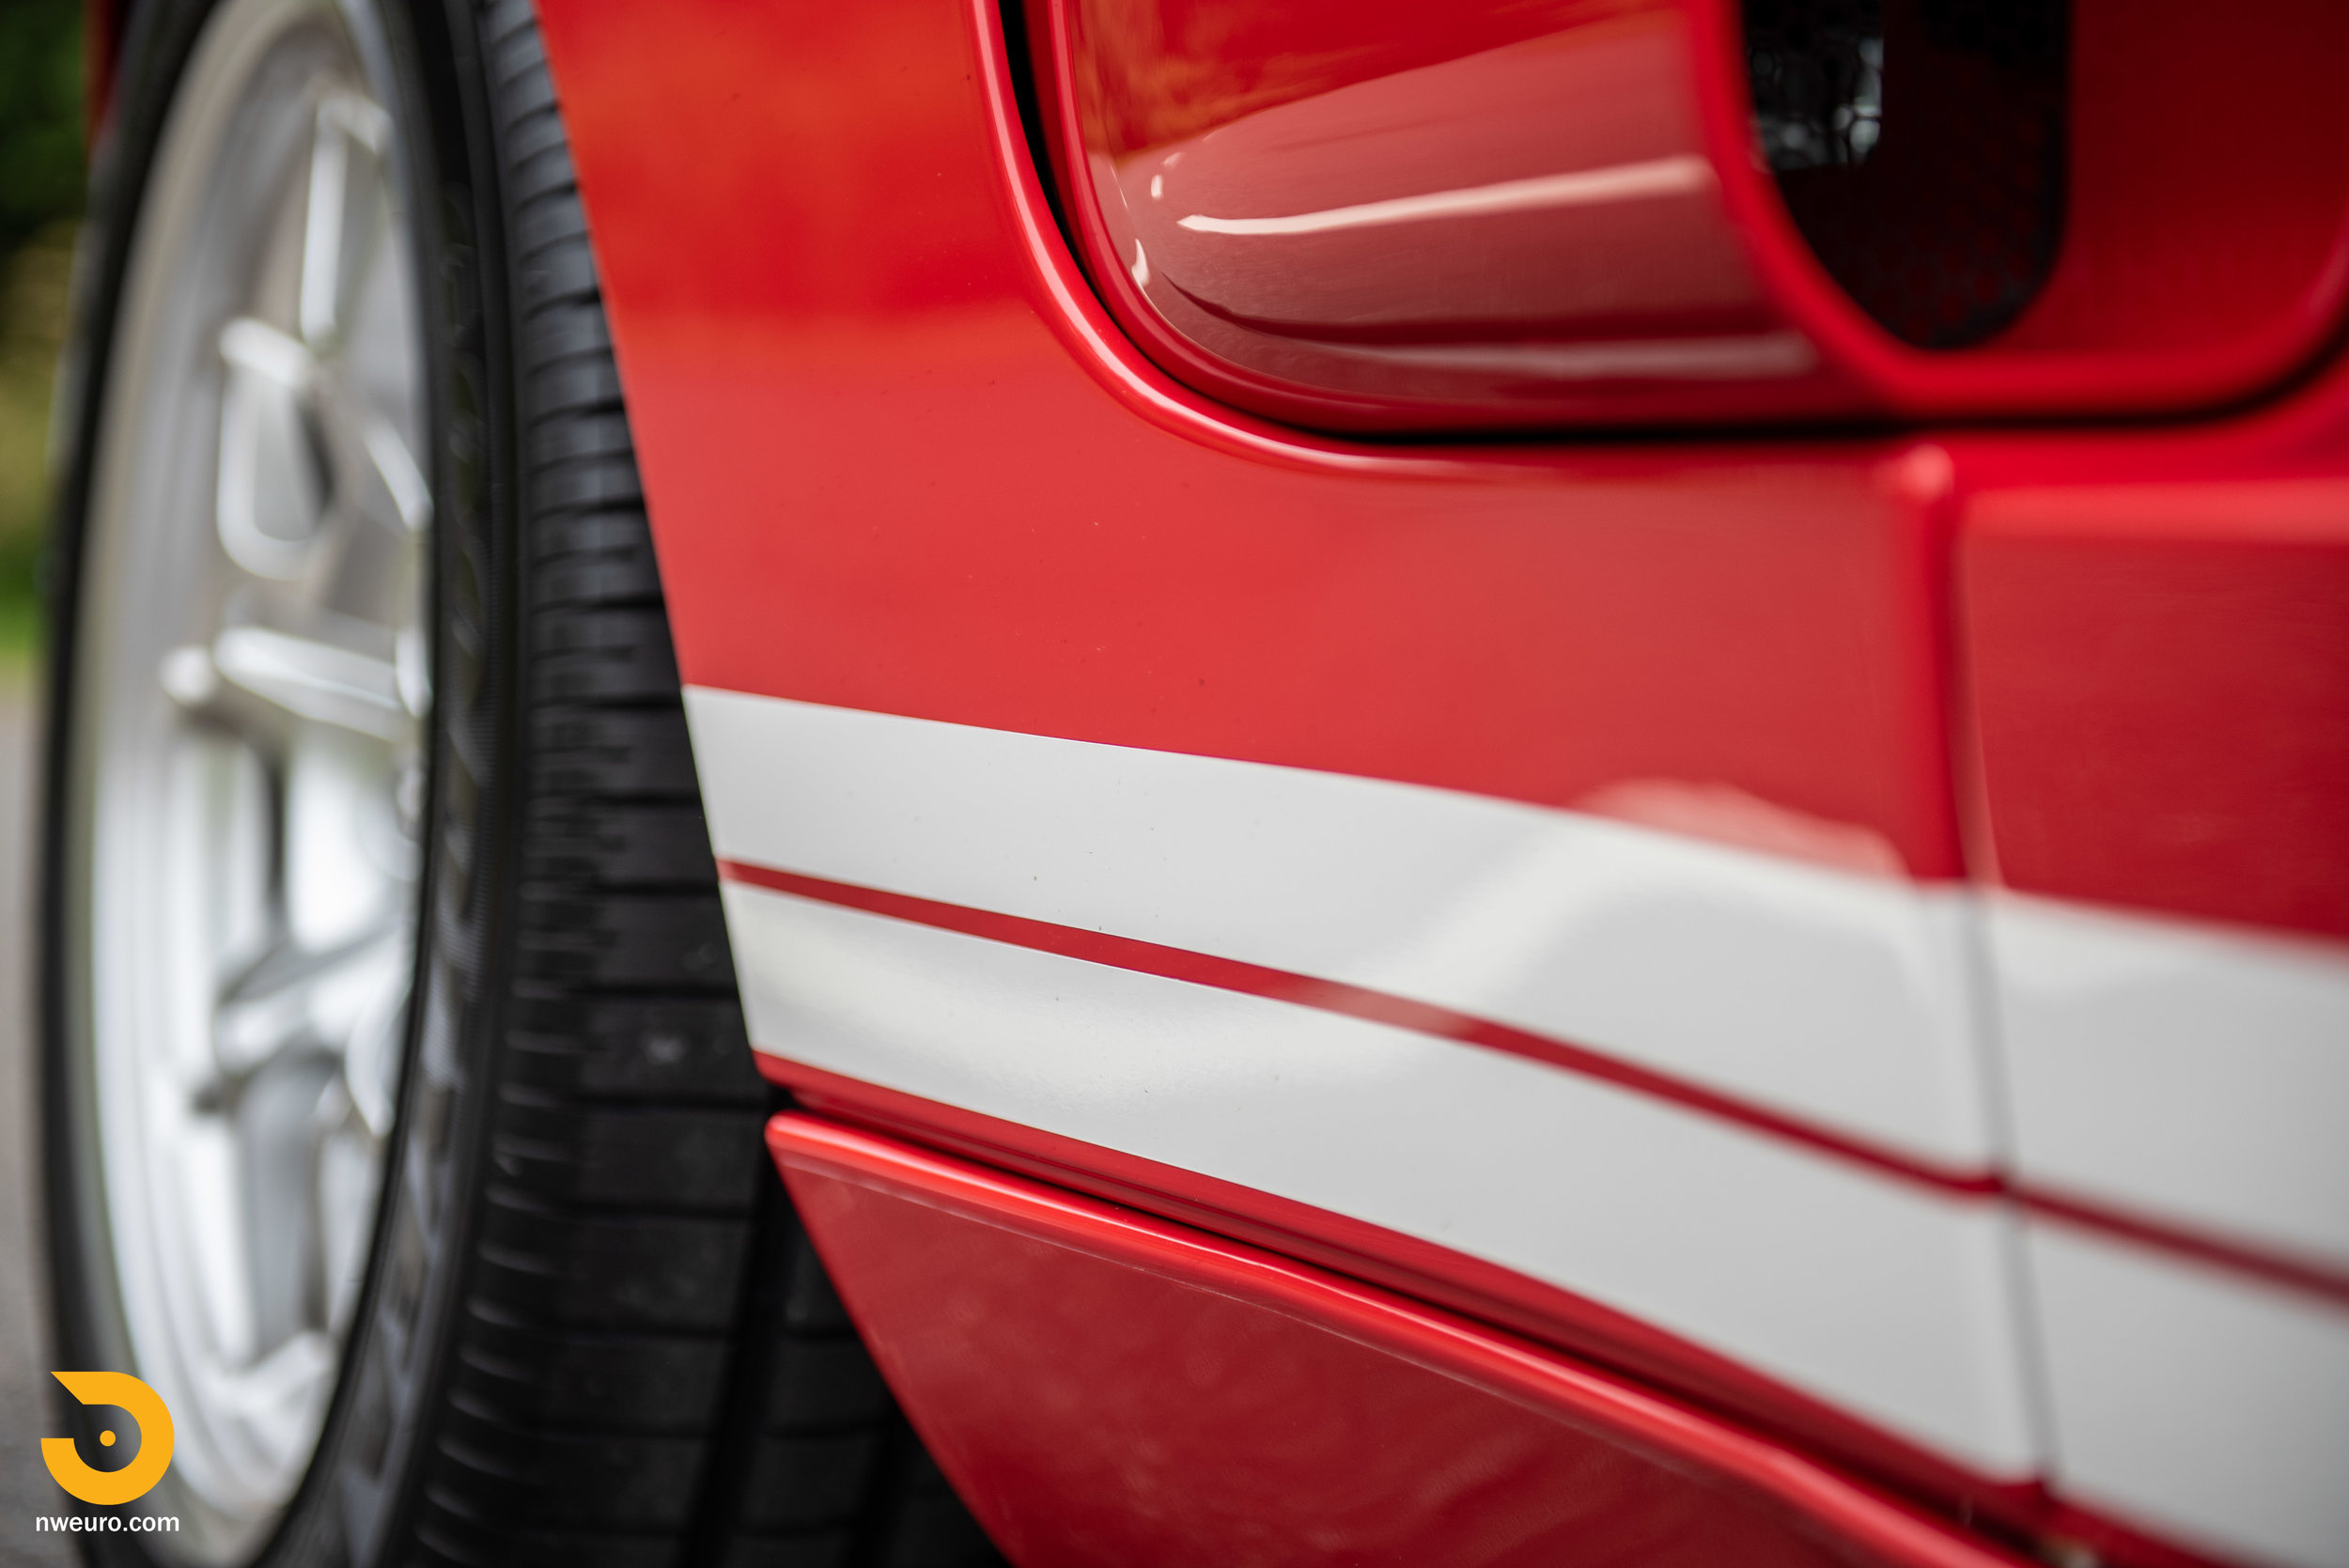 2005 Ford GT Red-99.jpg